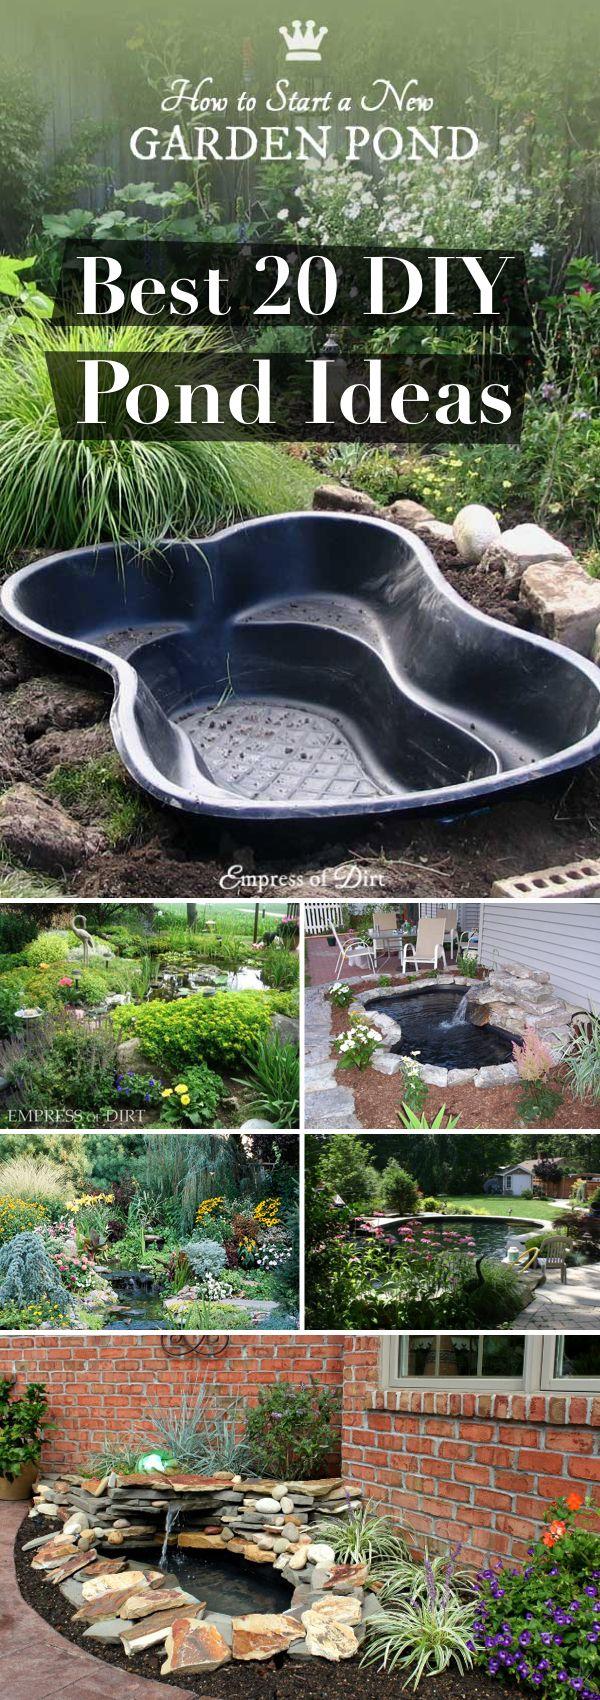 DIY Pond Ideas